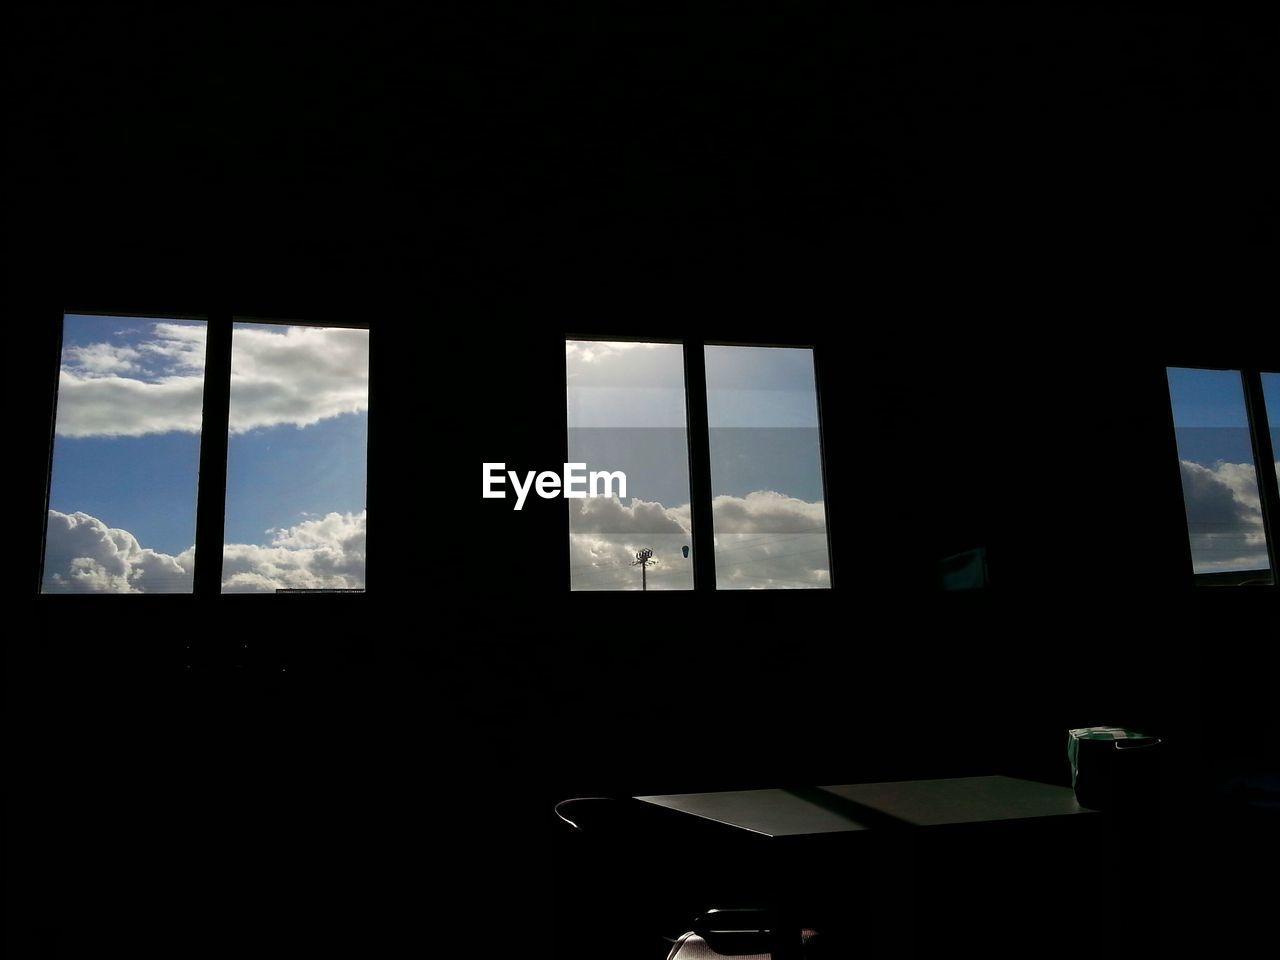 window, indoors, cloud - sky, no people, dark, sky, day, silhouette, nature, close-up